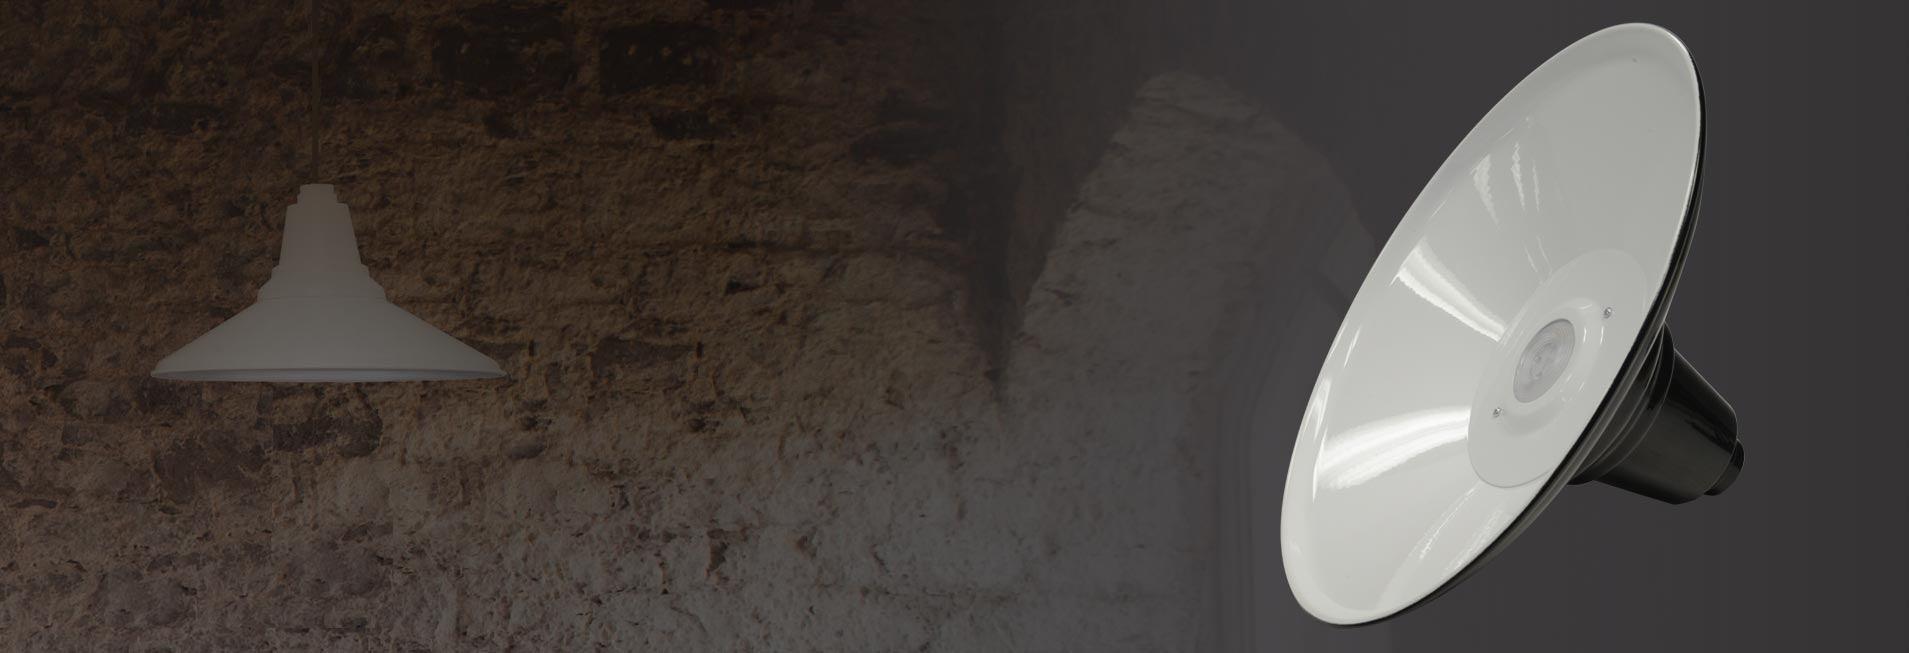 Calla LED Pendant Light weatherproof lifestyle